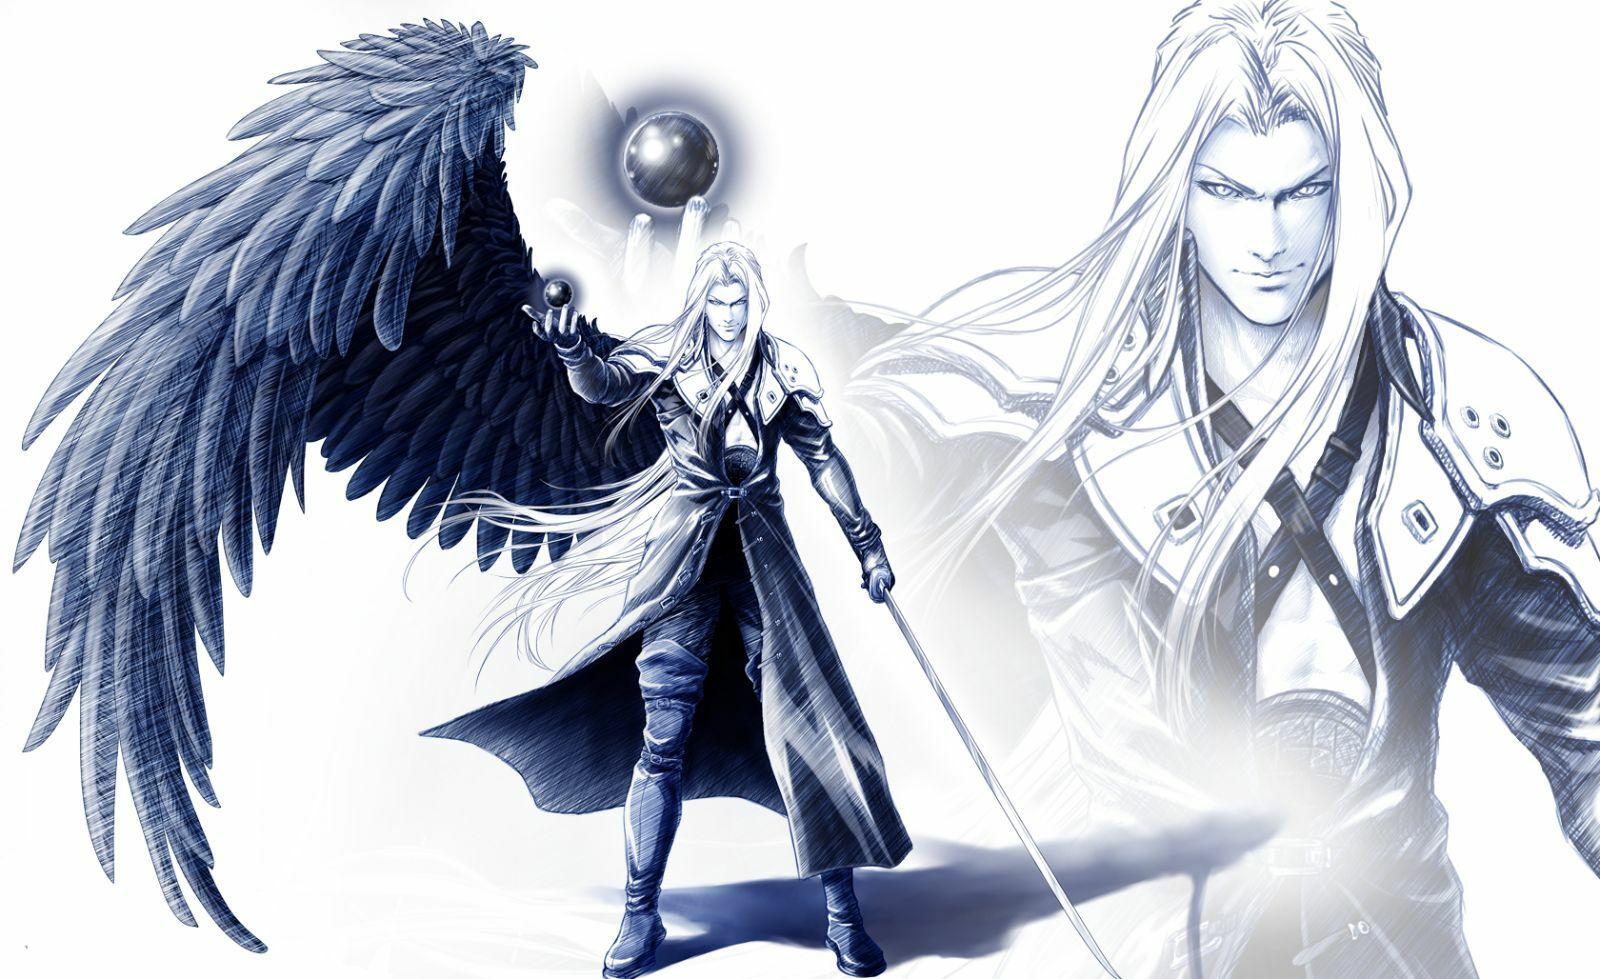 2019 Sephiroth Final Fantasy 7 Wall Decor Art Silk Print Poster 8888 From Lyshop007 13 26 Dhgate Com